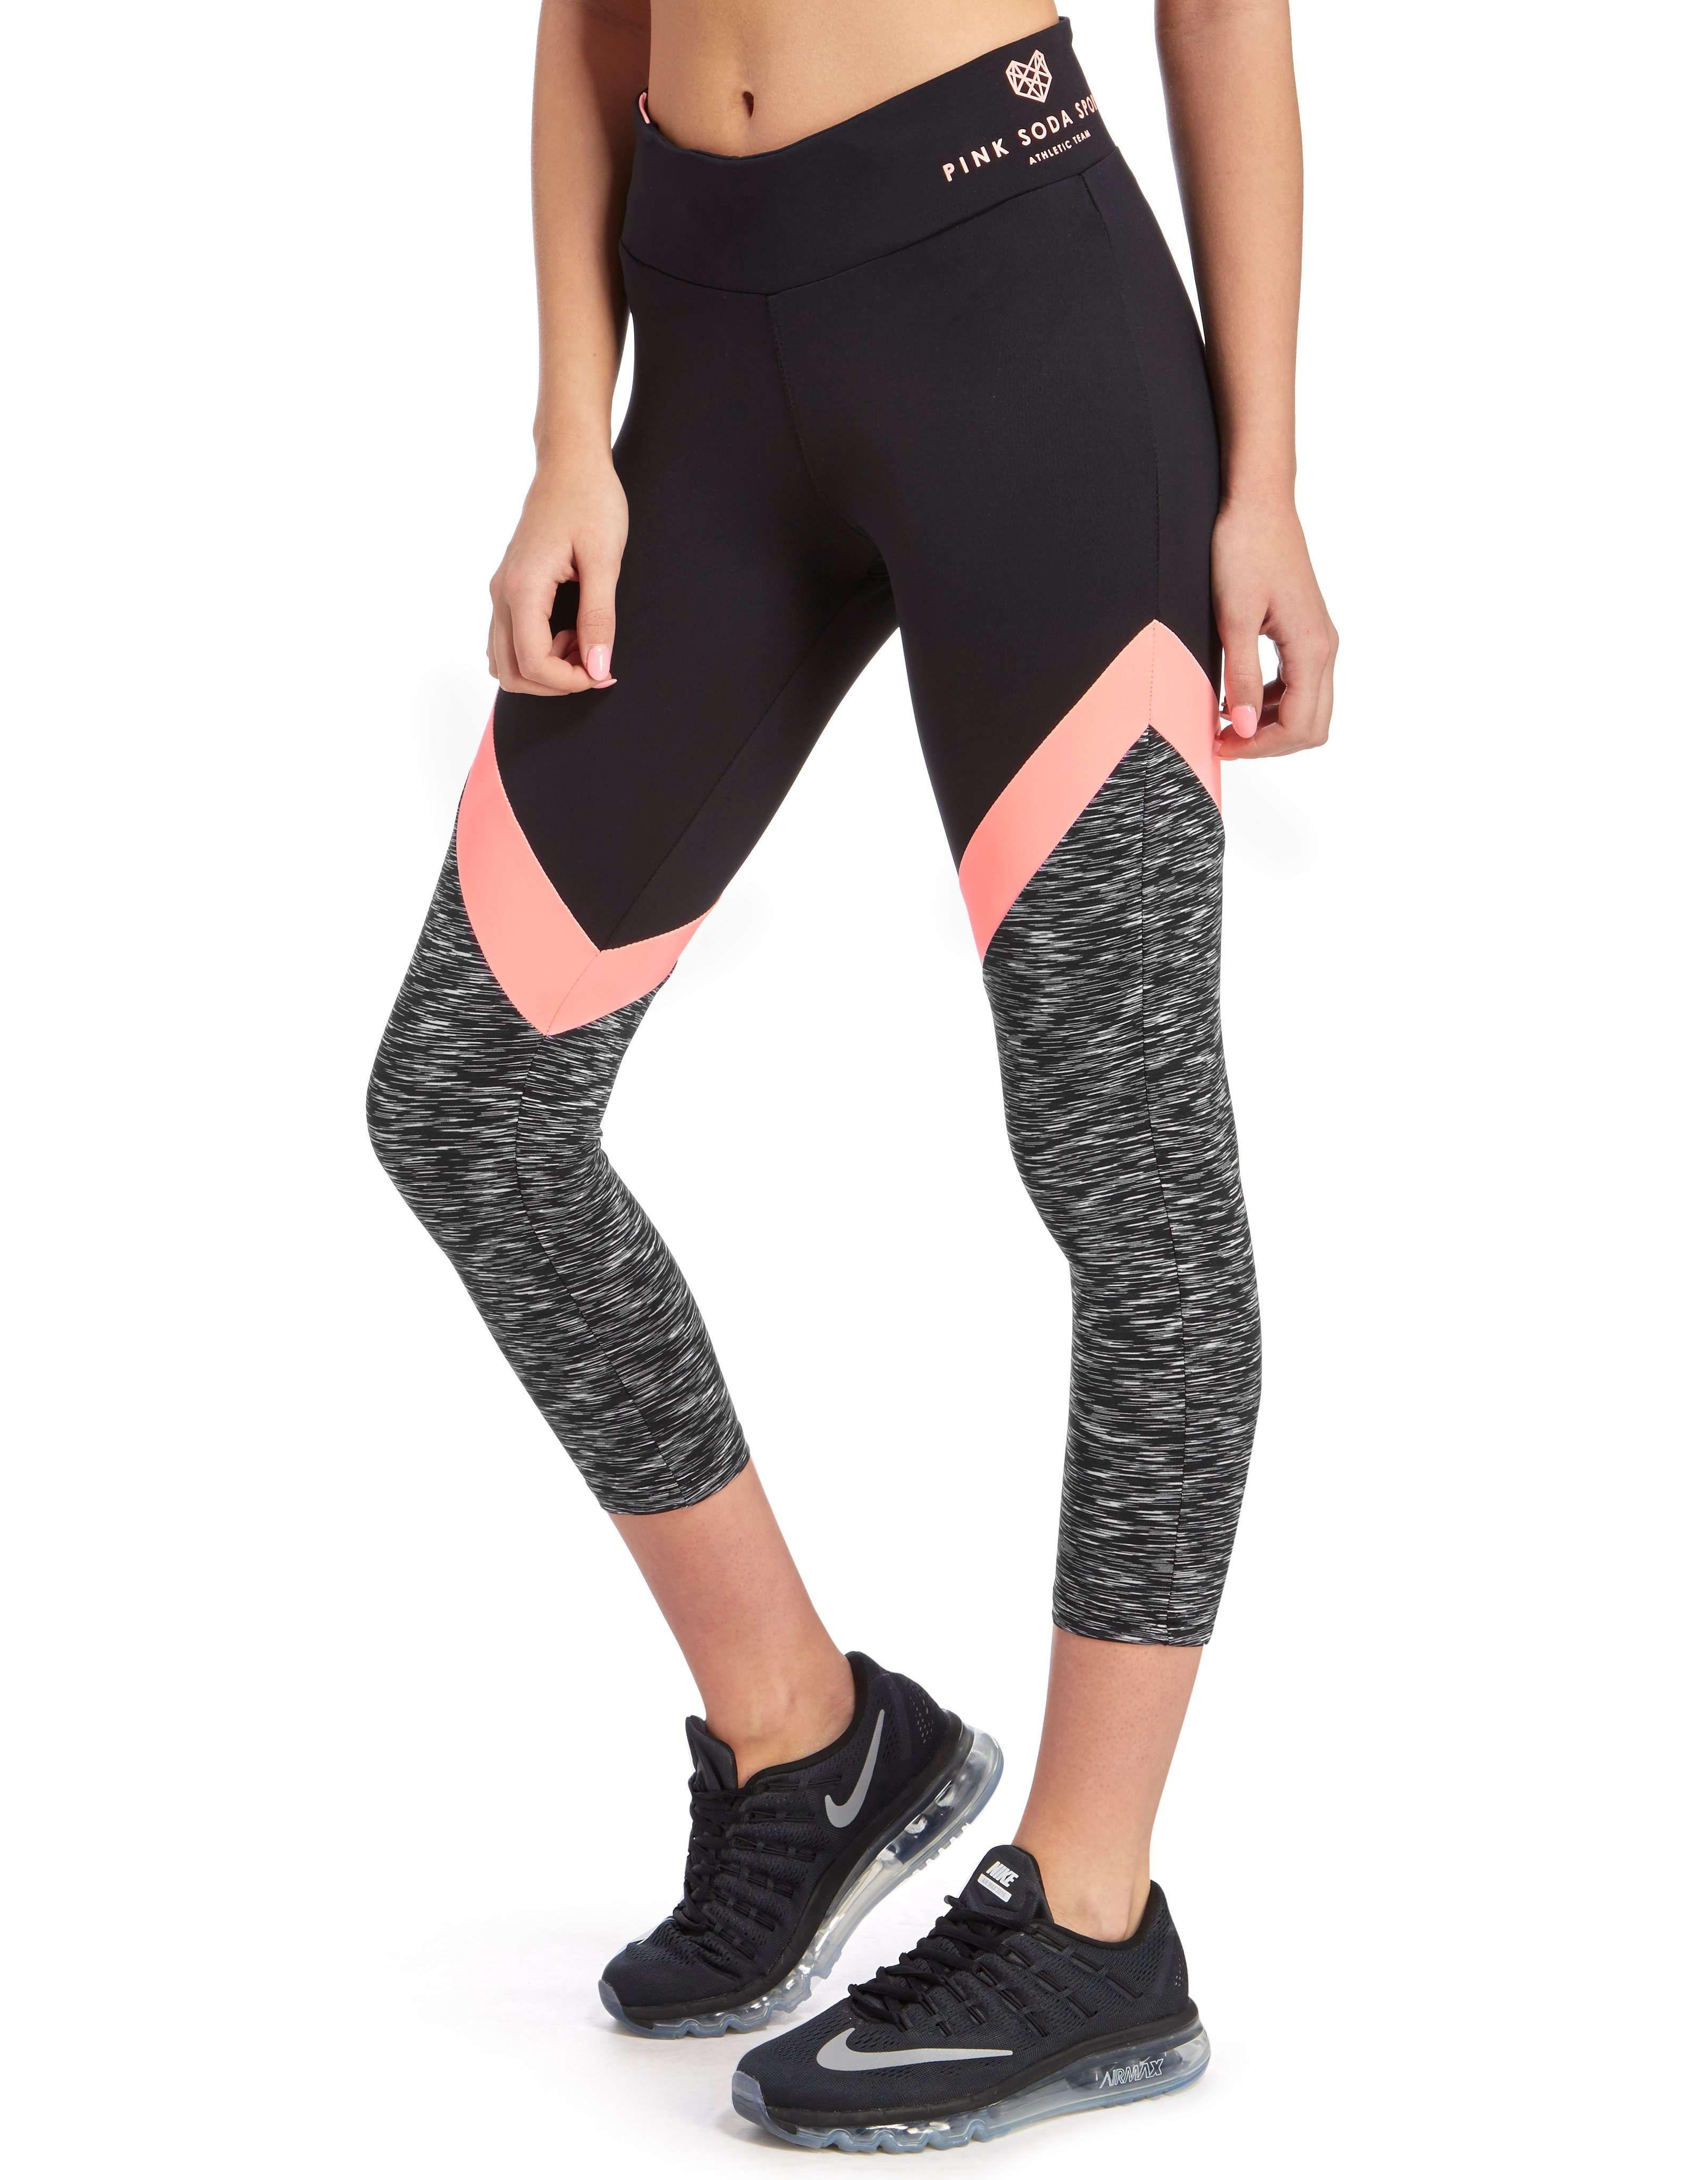 f93c2ef43325e3 Pink Soda Sport Space Dye Capri Leggings - Shop online for Pink Soda Sport  Space Dye